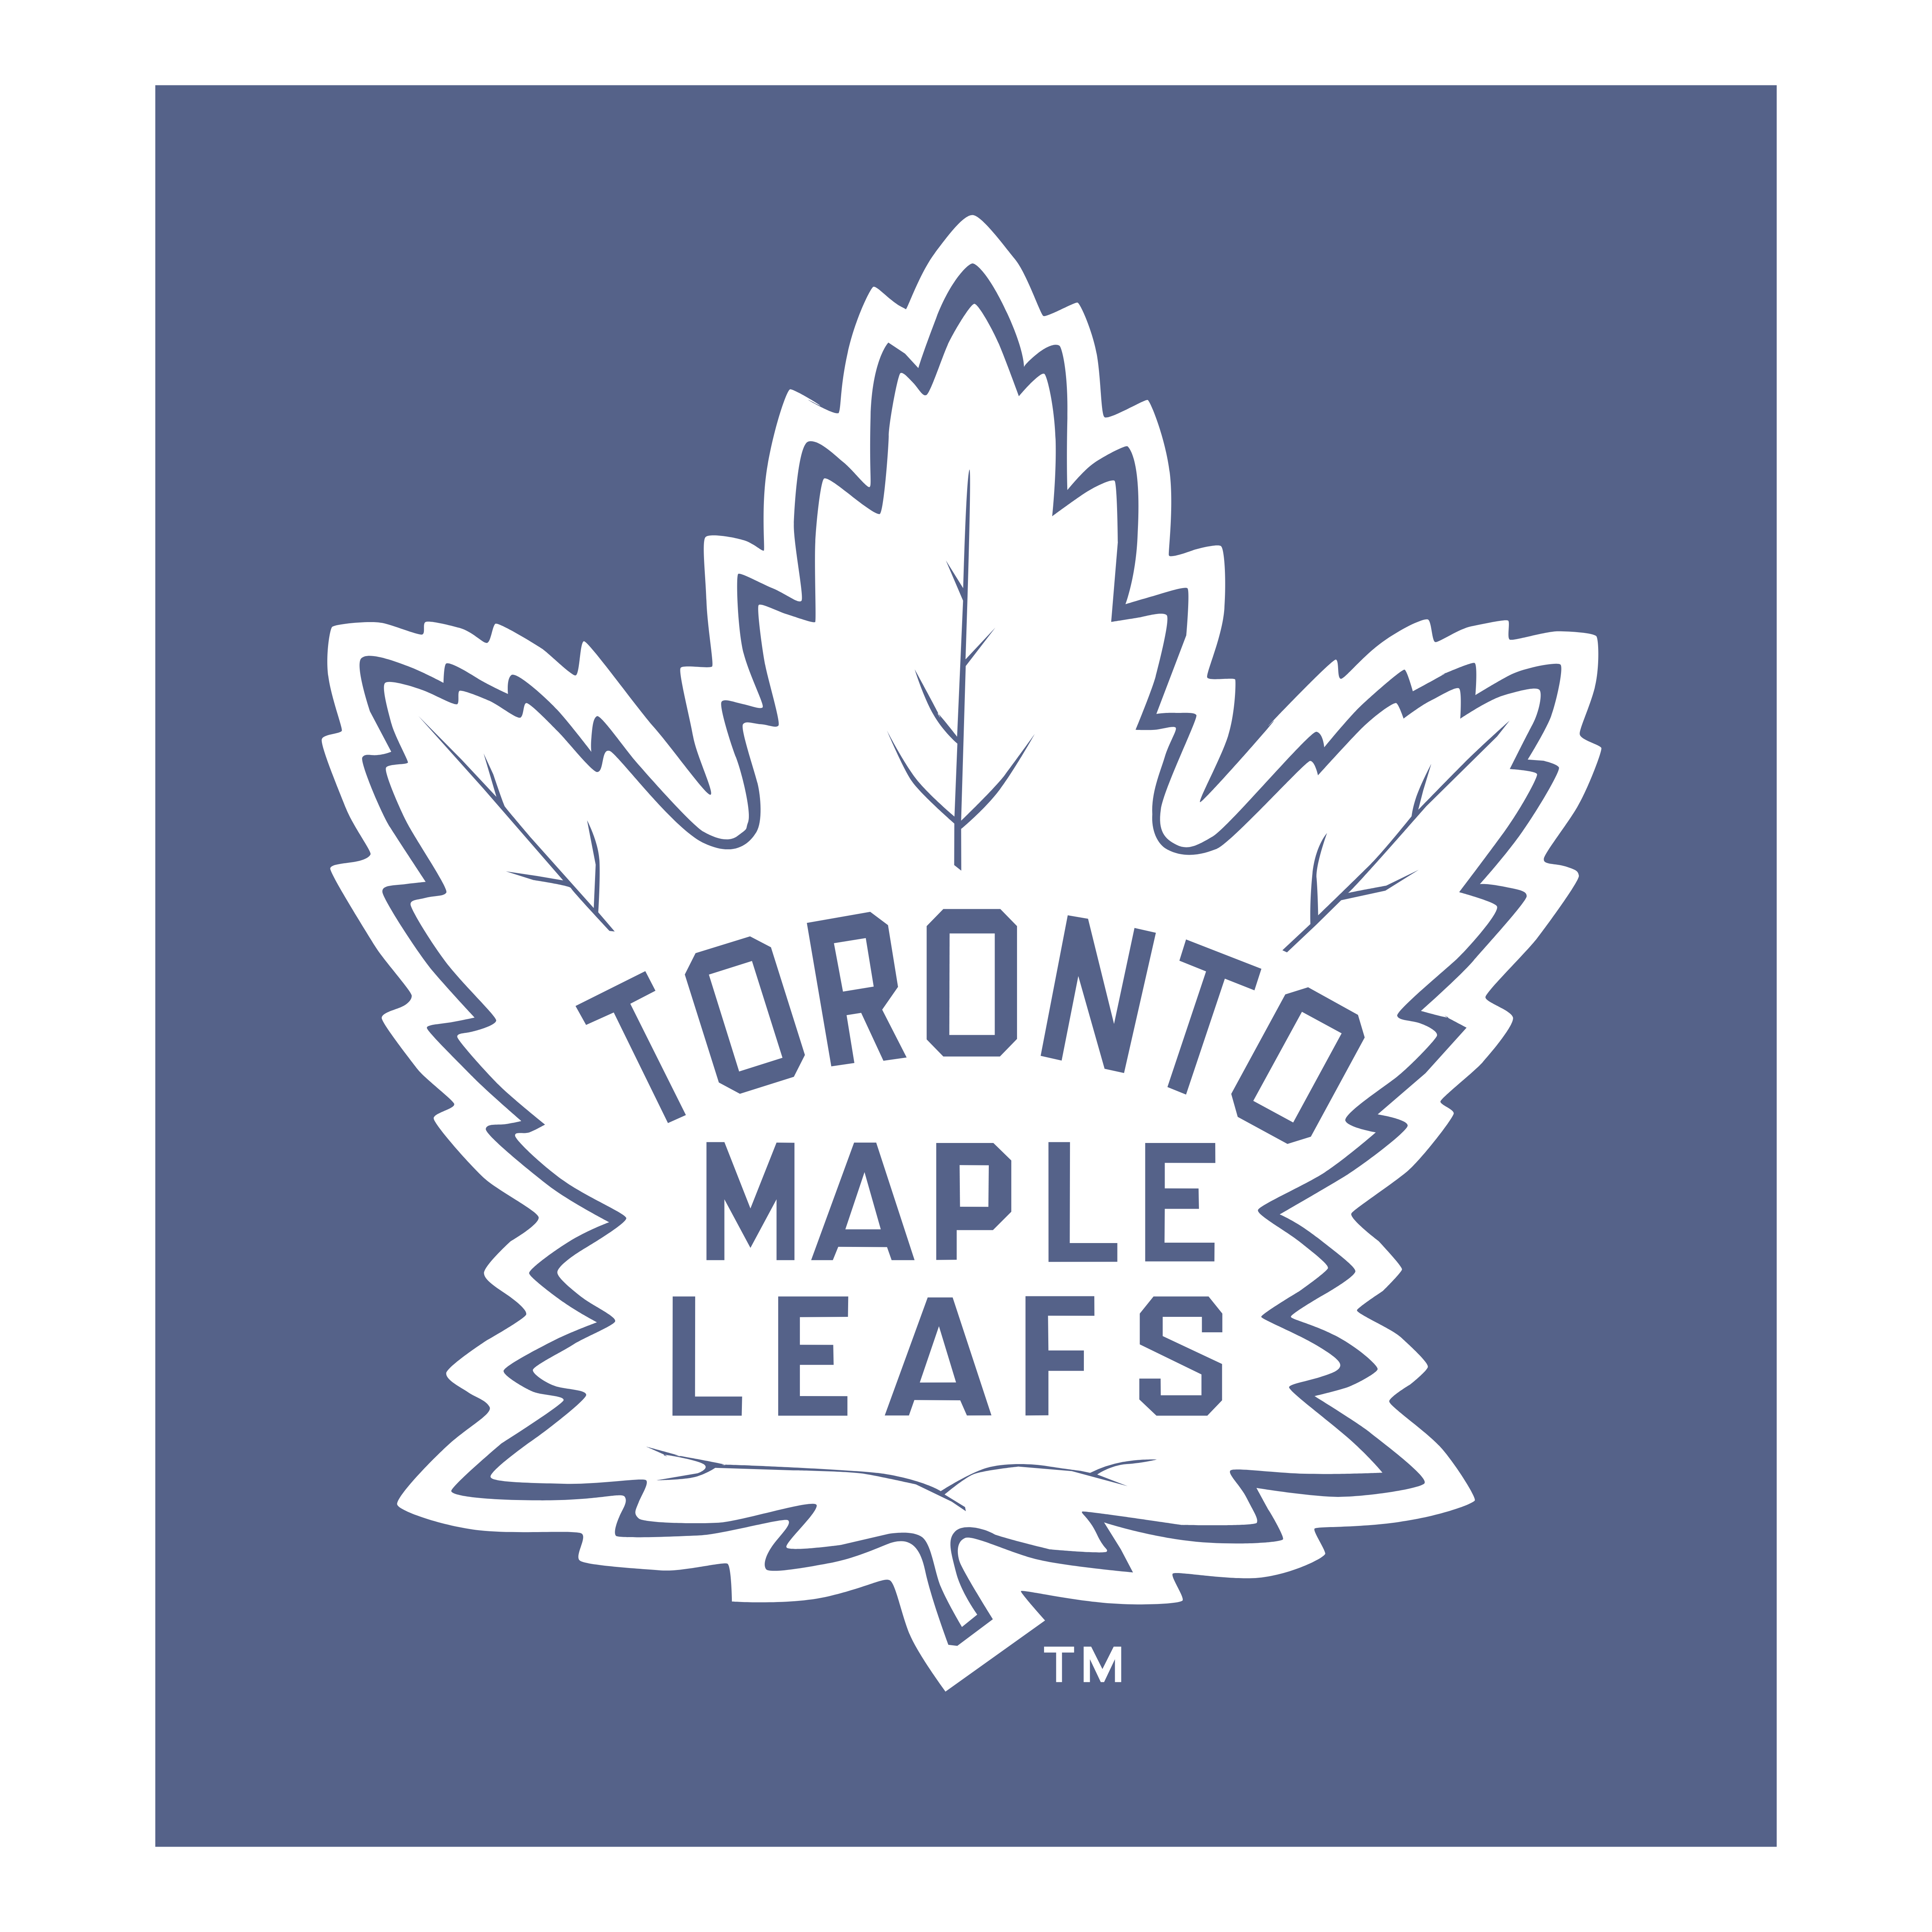 Toronto Maple Leafs - Logos Download